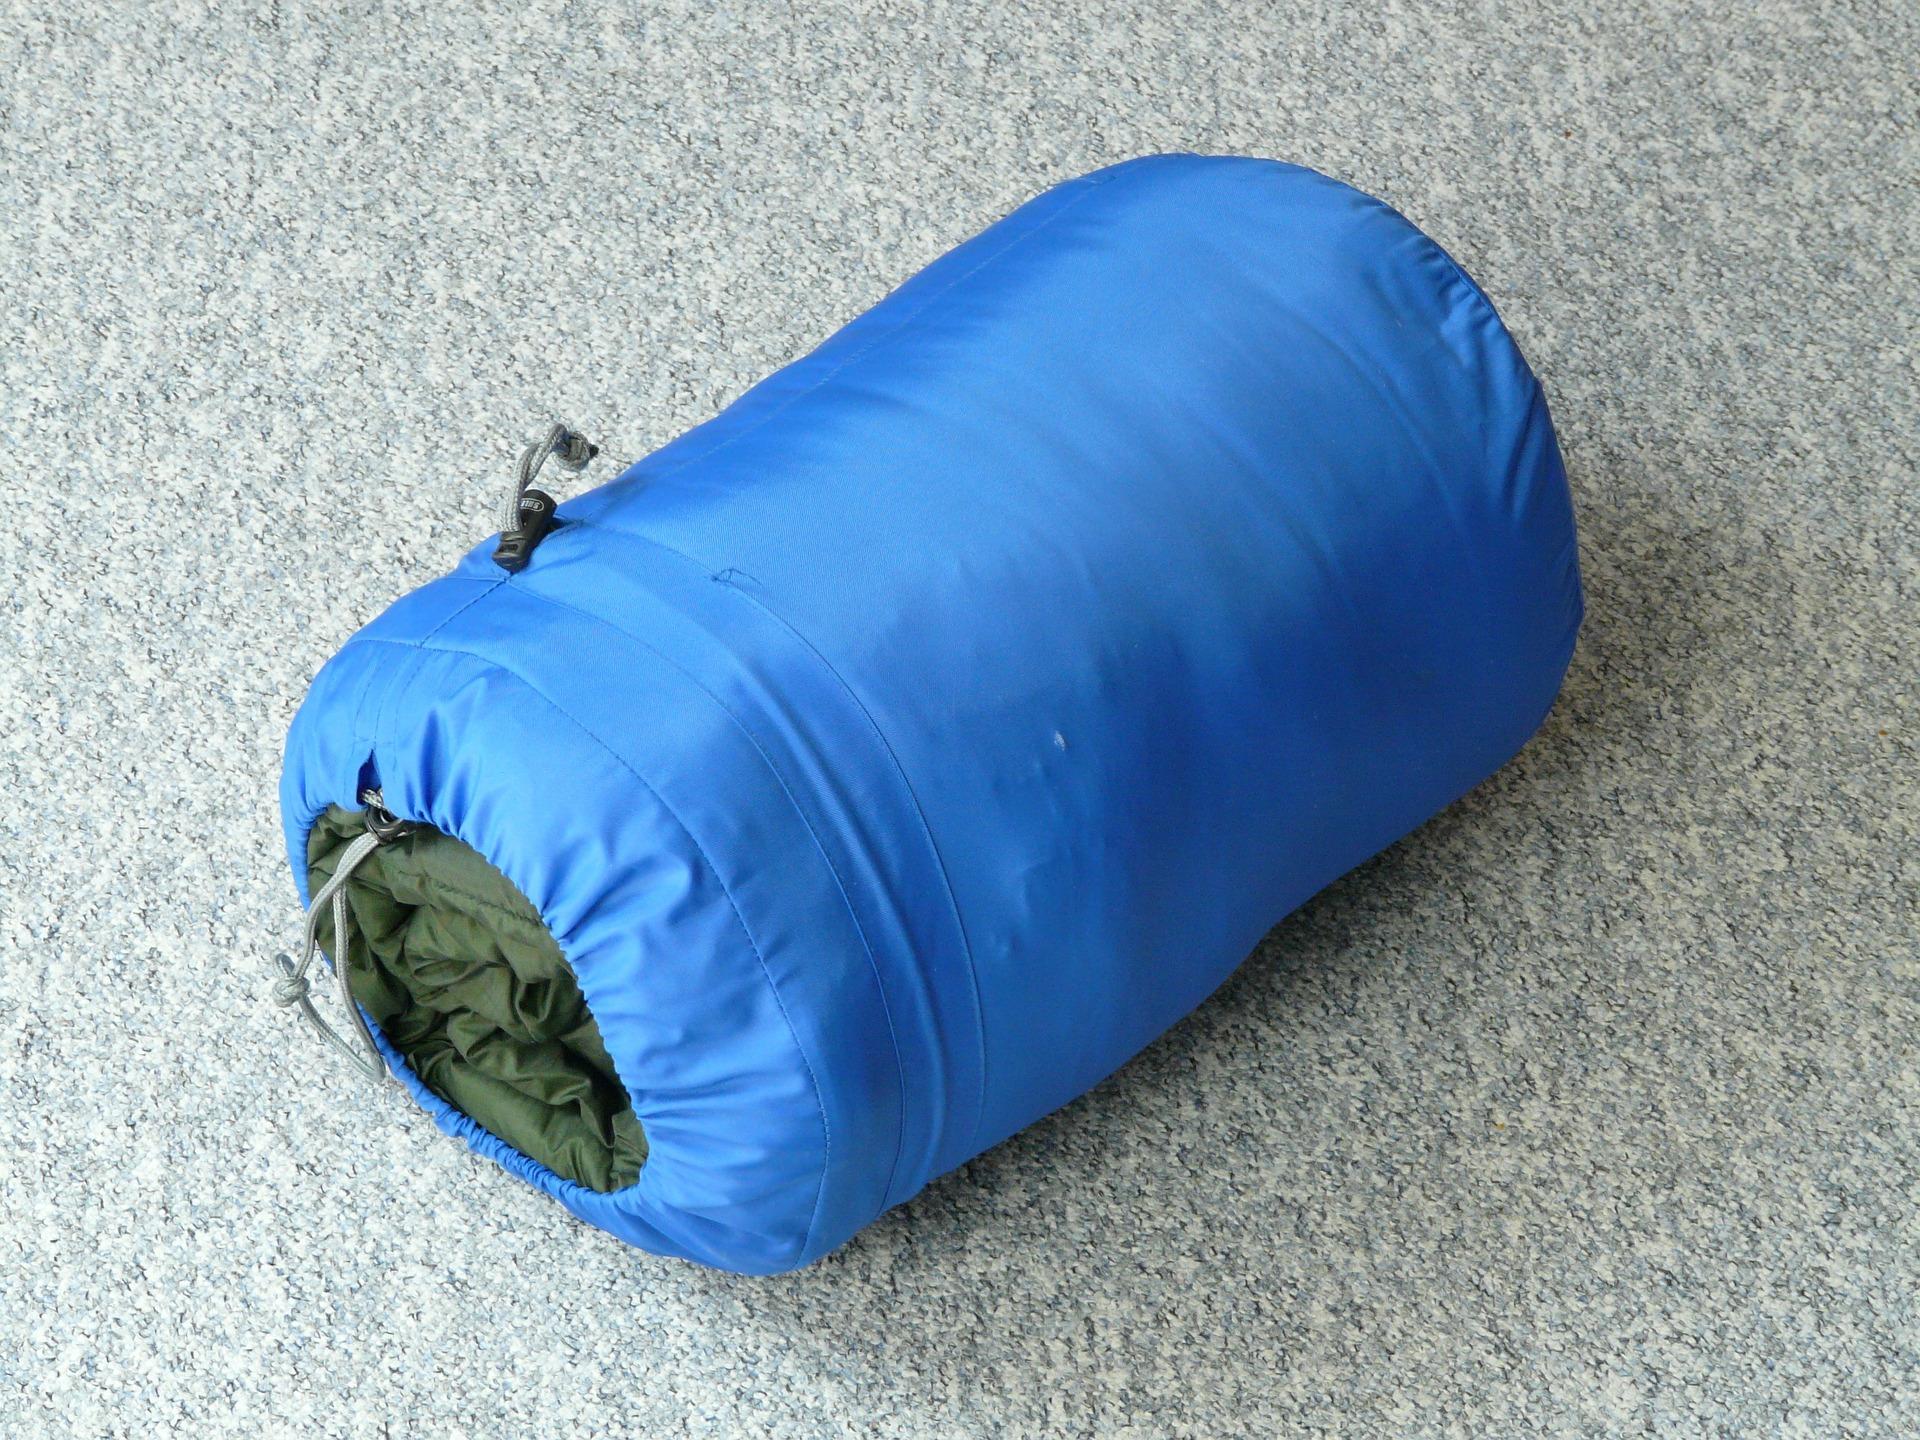 sleeping-bag-59653_1920.jpg